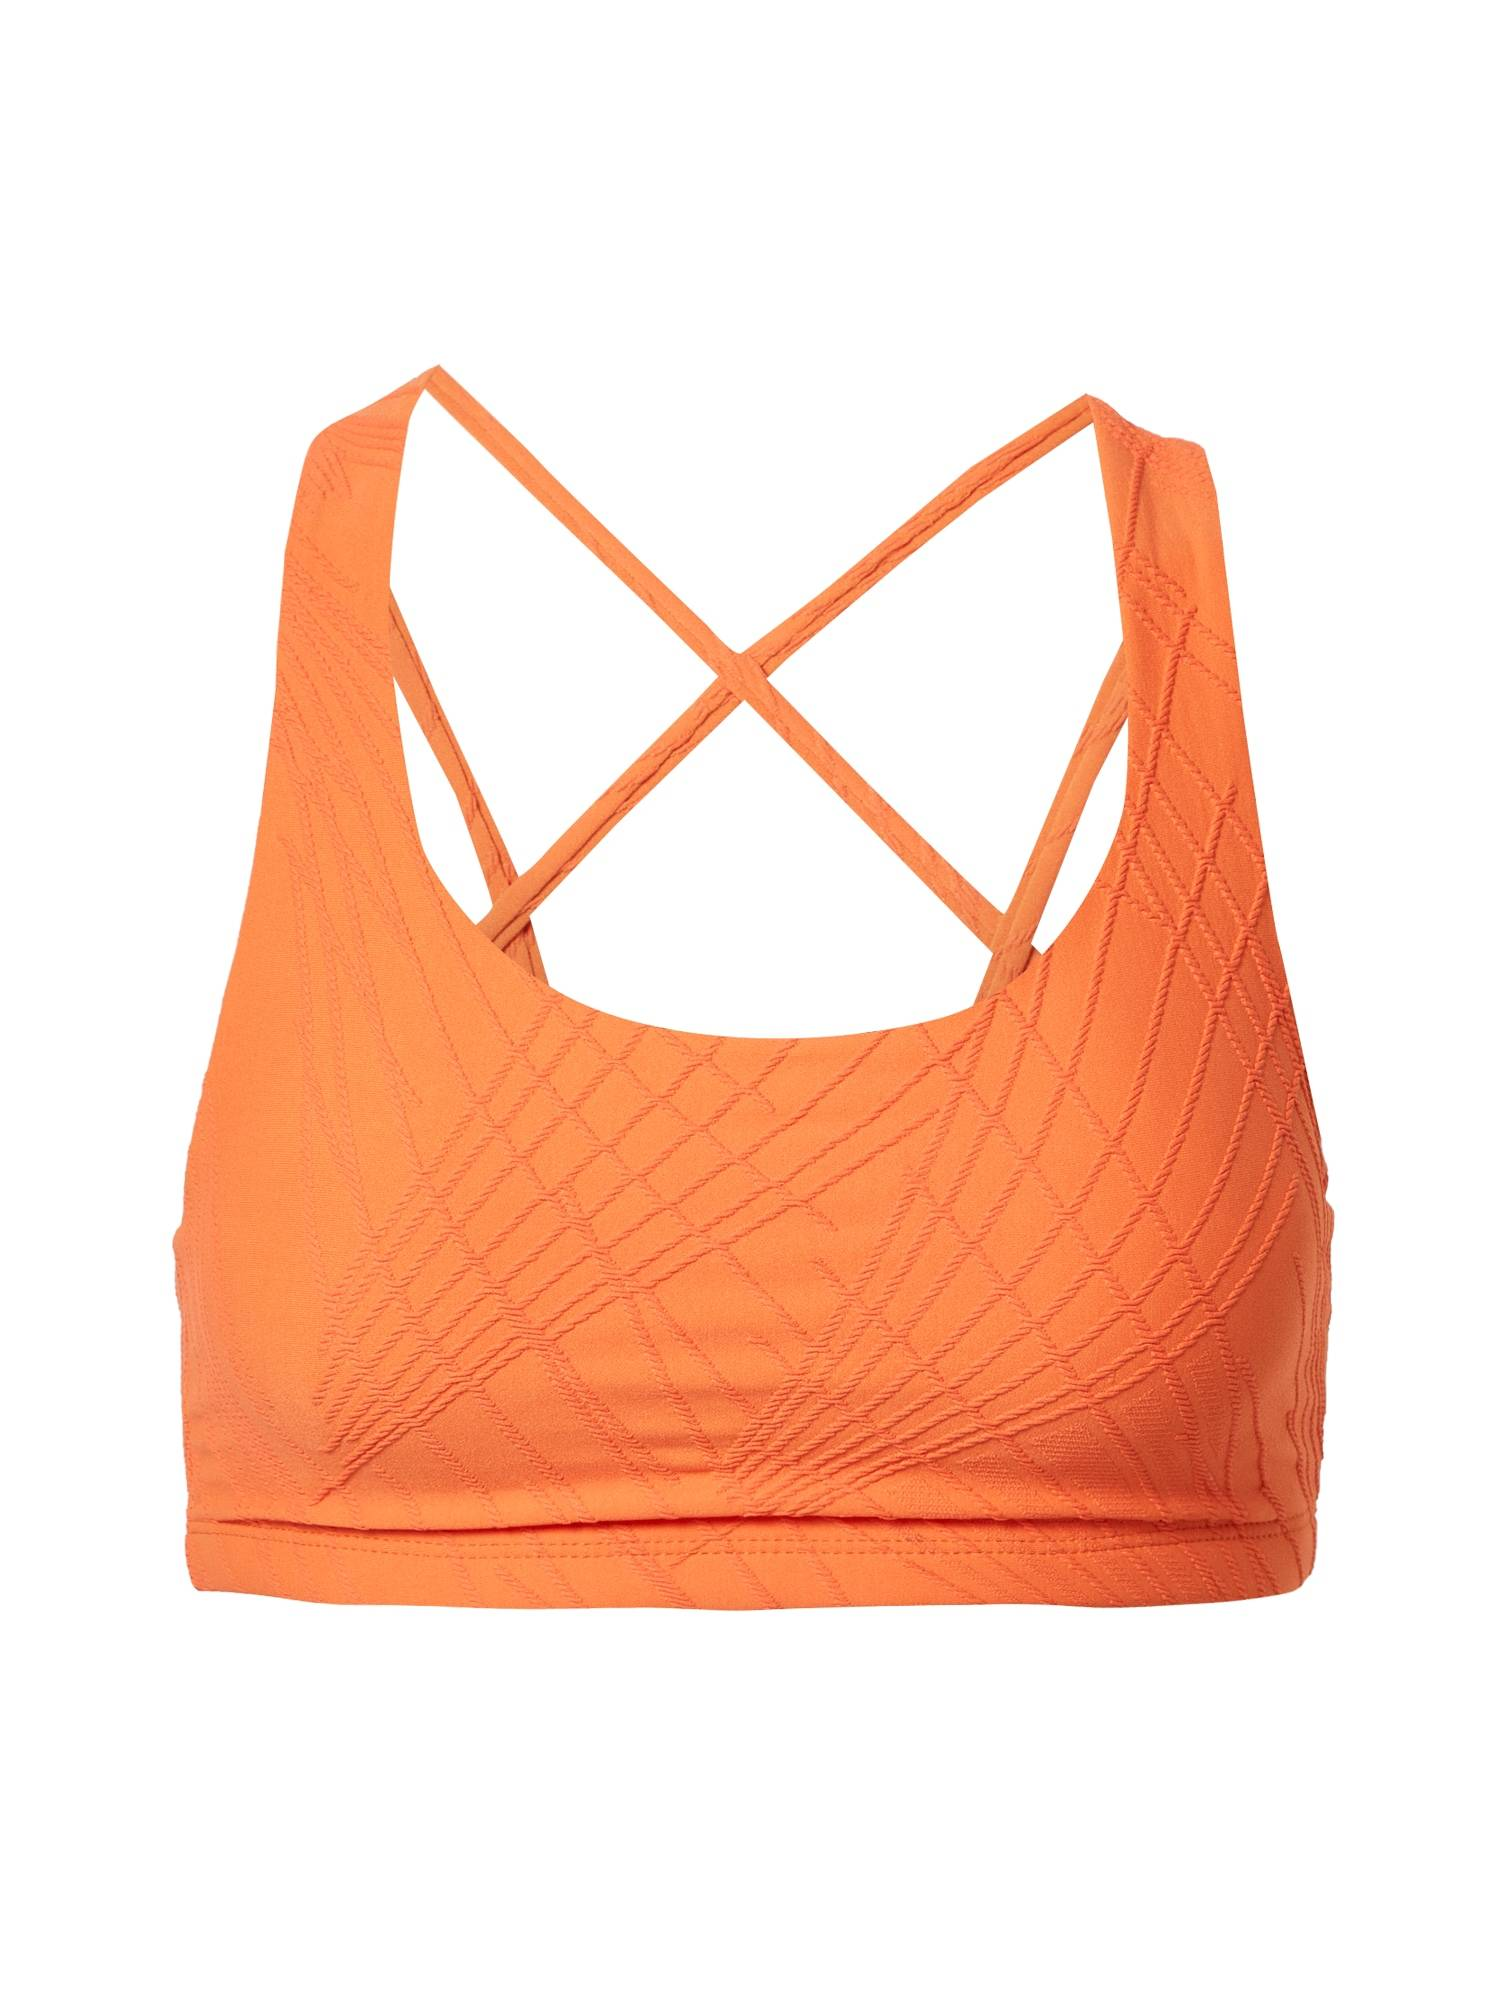 Onzie Soutien-gorge de sport 'Selenite Mudra'  - Orange - Taille: S-M - female